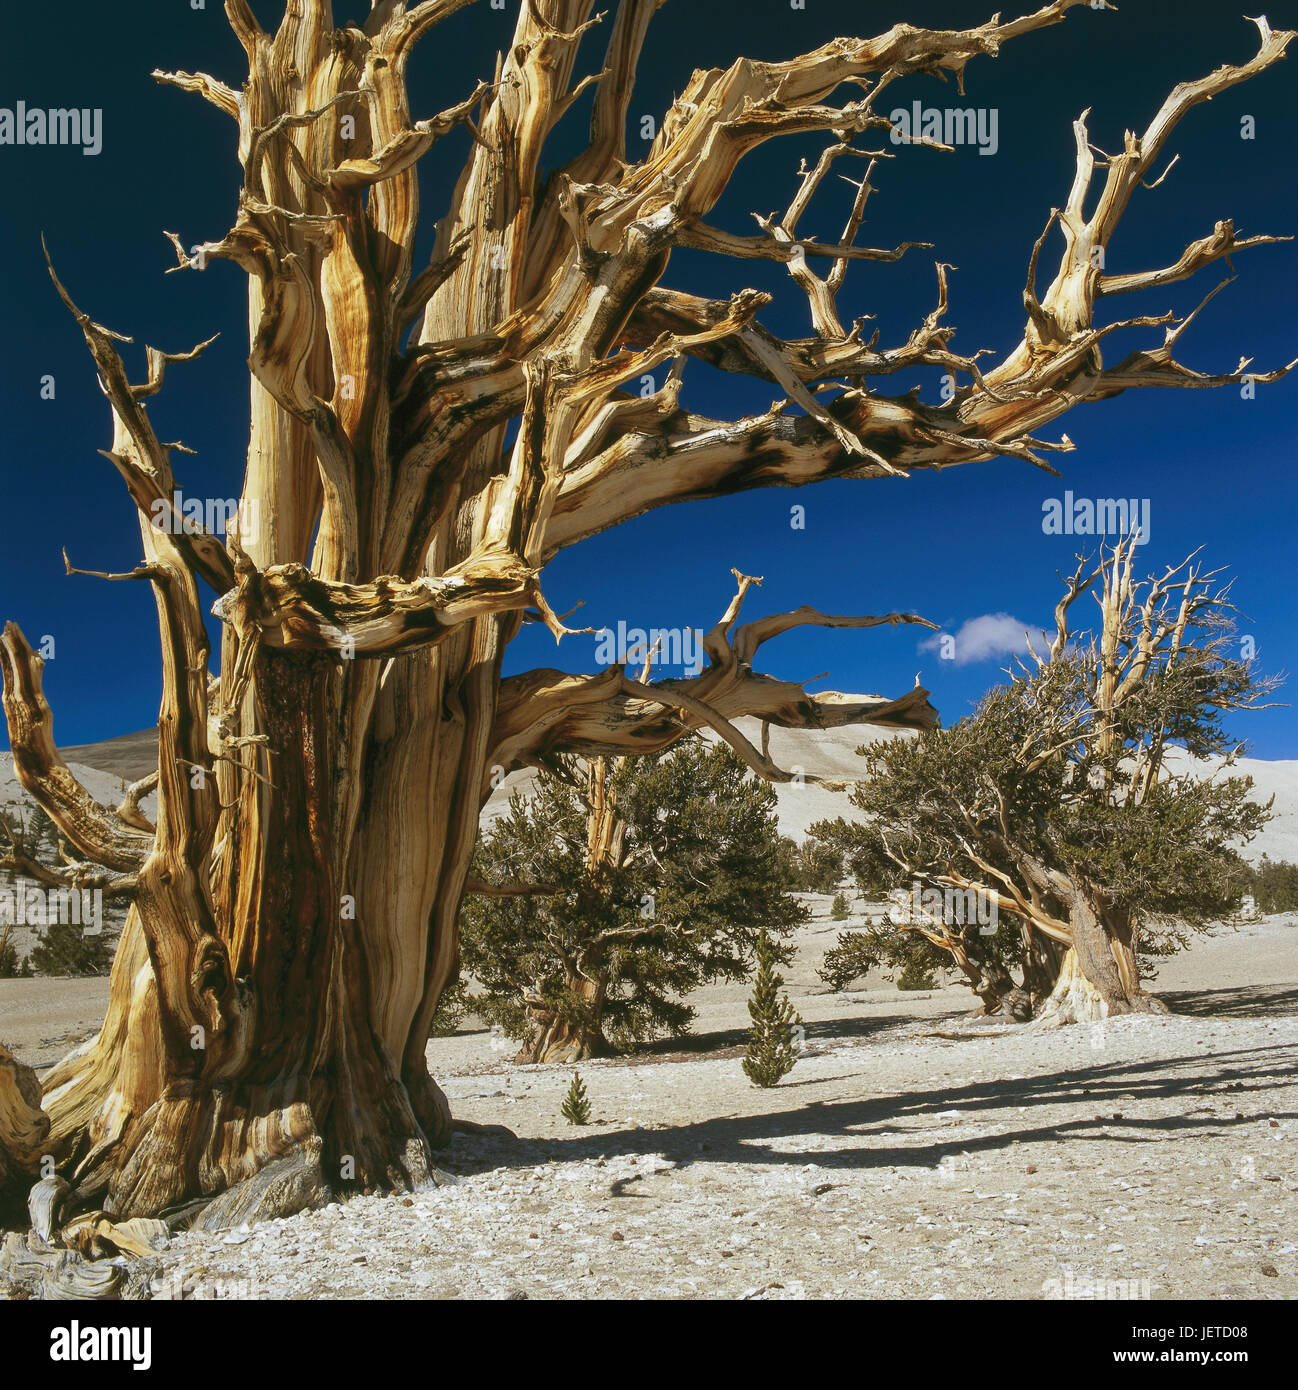 The USA, California, White Mountains, Acient Bristlecone Pine Forest, long-lasting pines, Pinus longaeva, North - Stock Image